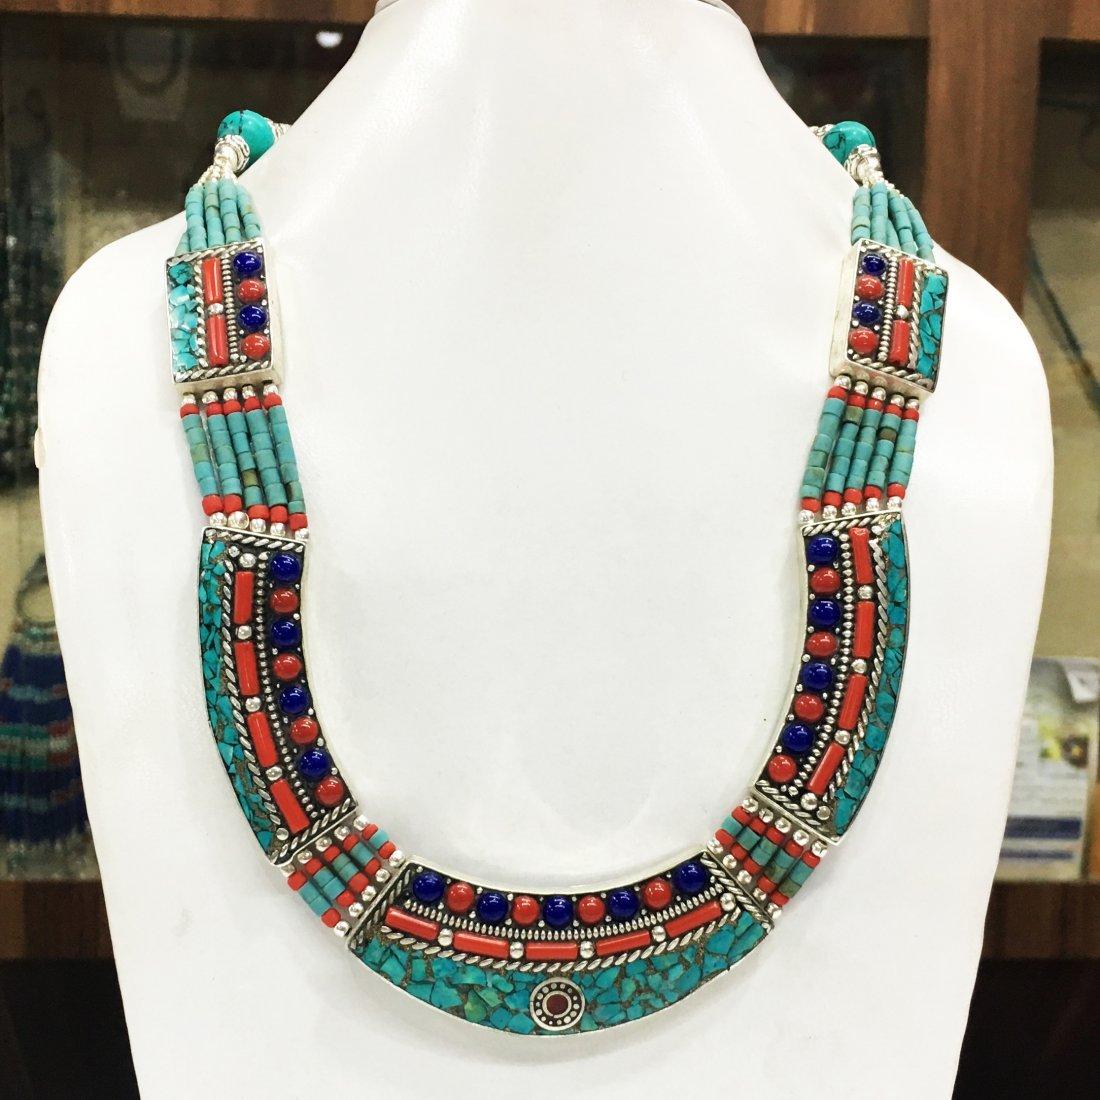 Designer Handmade Ethnic Handmade Necklace